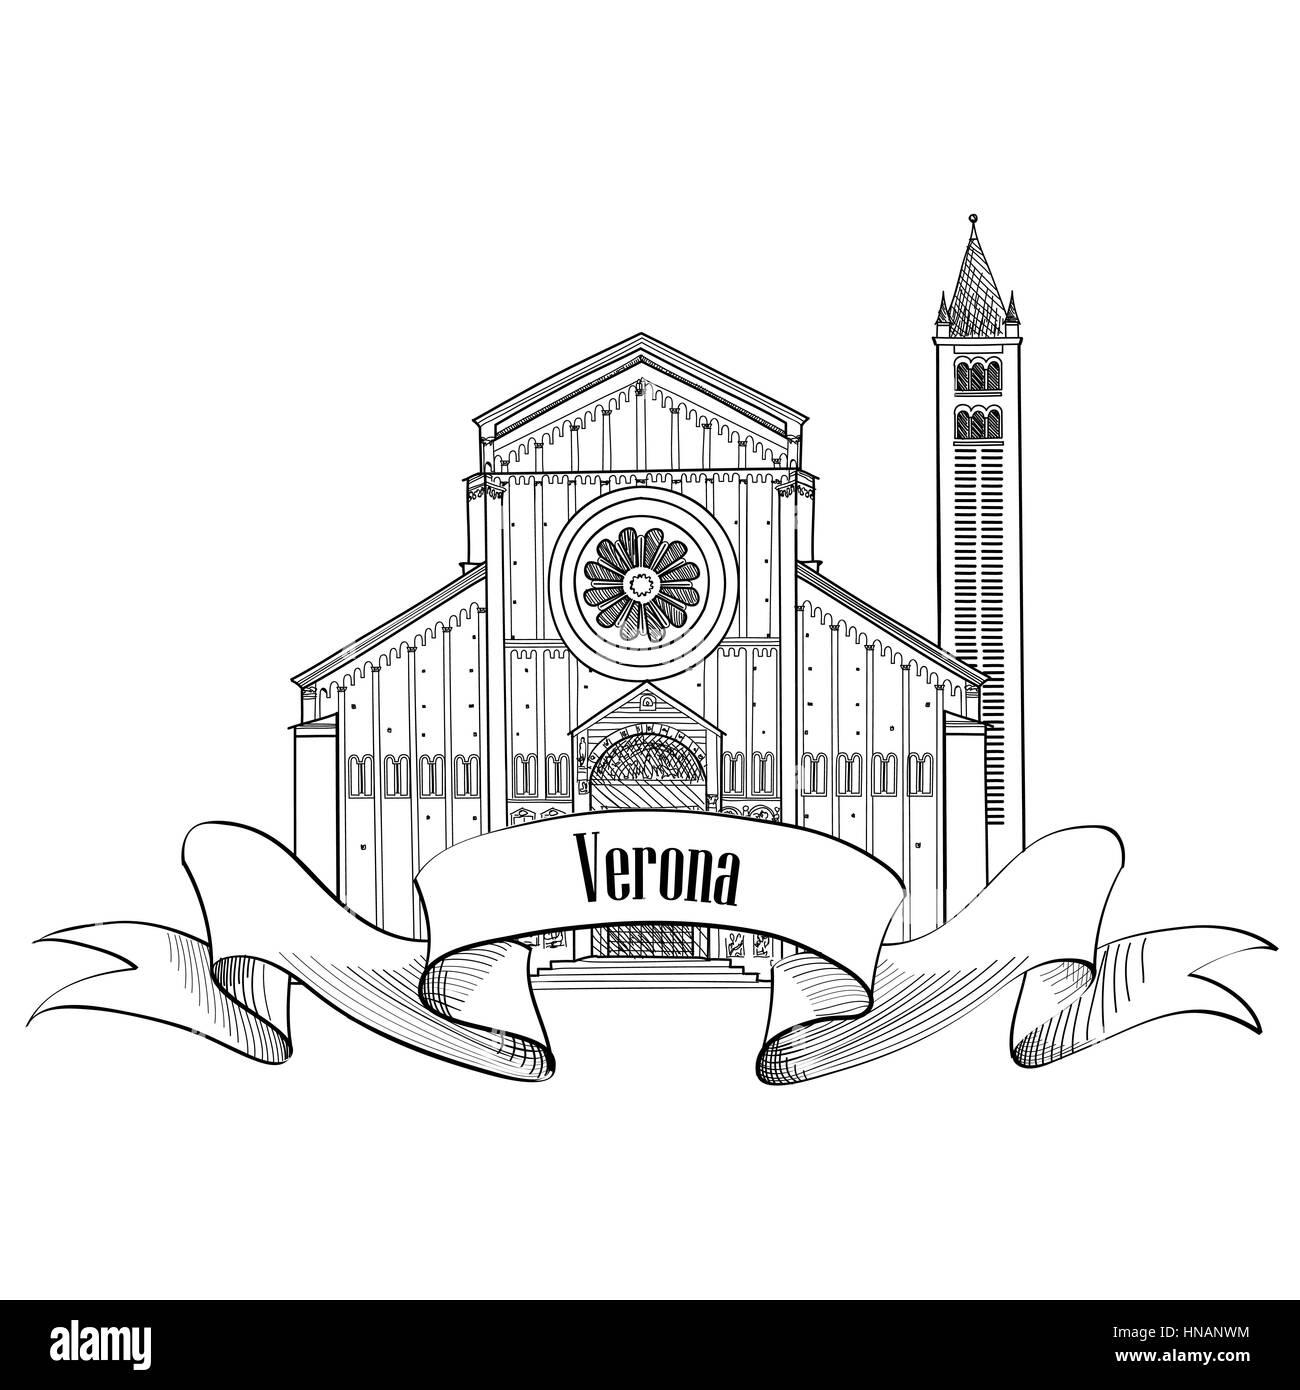 Verona city label. travel Italy icon. Famous italian building Church of San Zeno sketch. Sightseeing icon. - Stock Vector